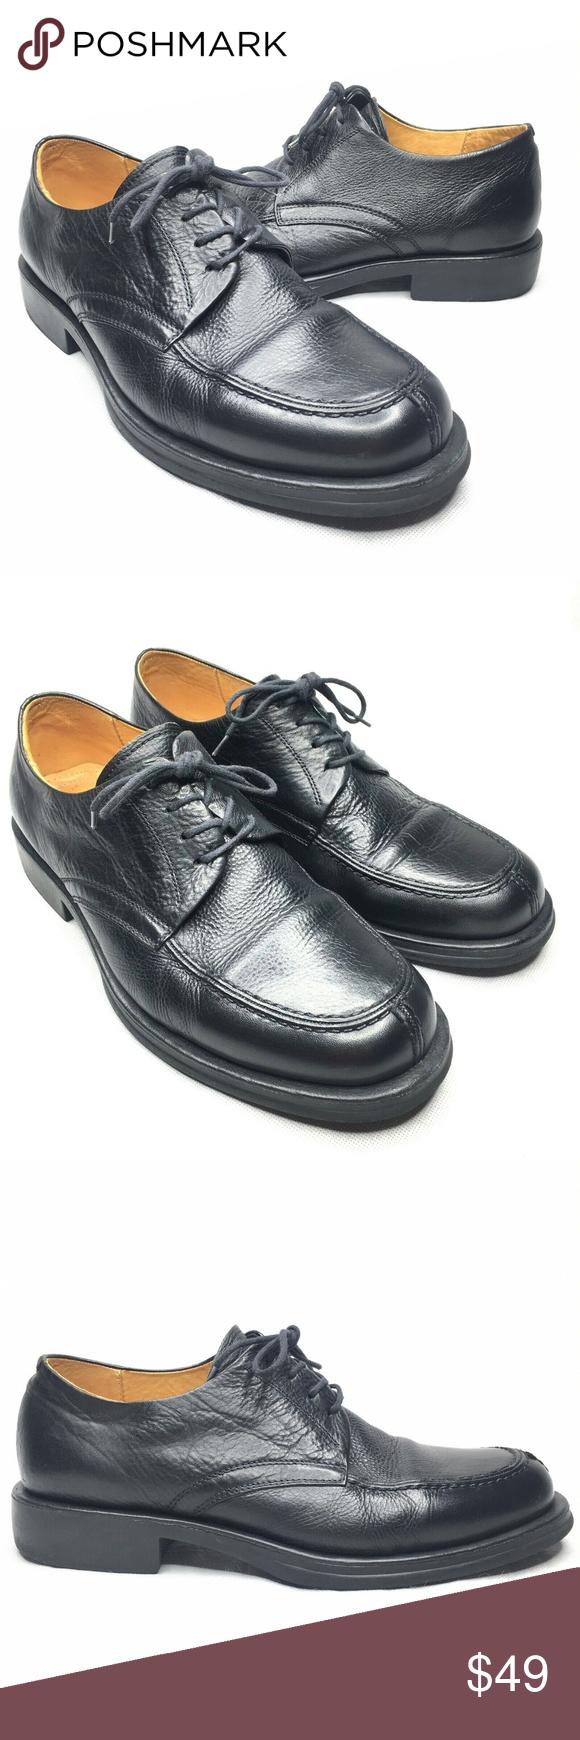 Sandro Moscolini Vineyard Black Dress Shoe Classic Black Dress Shoe Dress Shoes Men Sandro Moscoloni Shoes [ 1740 x 580 Pixel ]